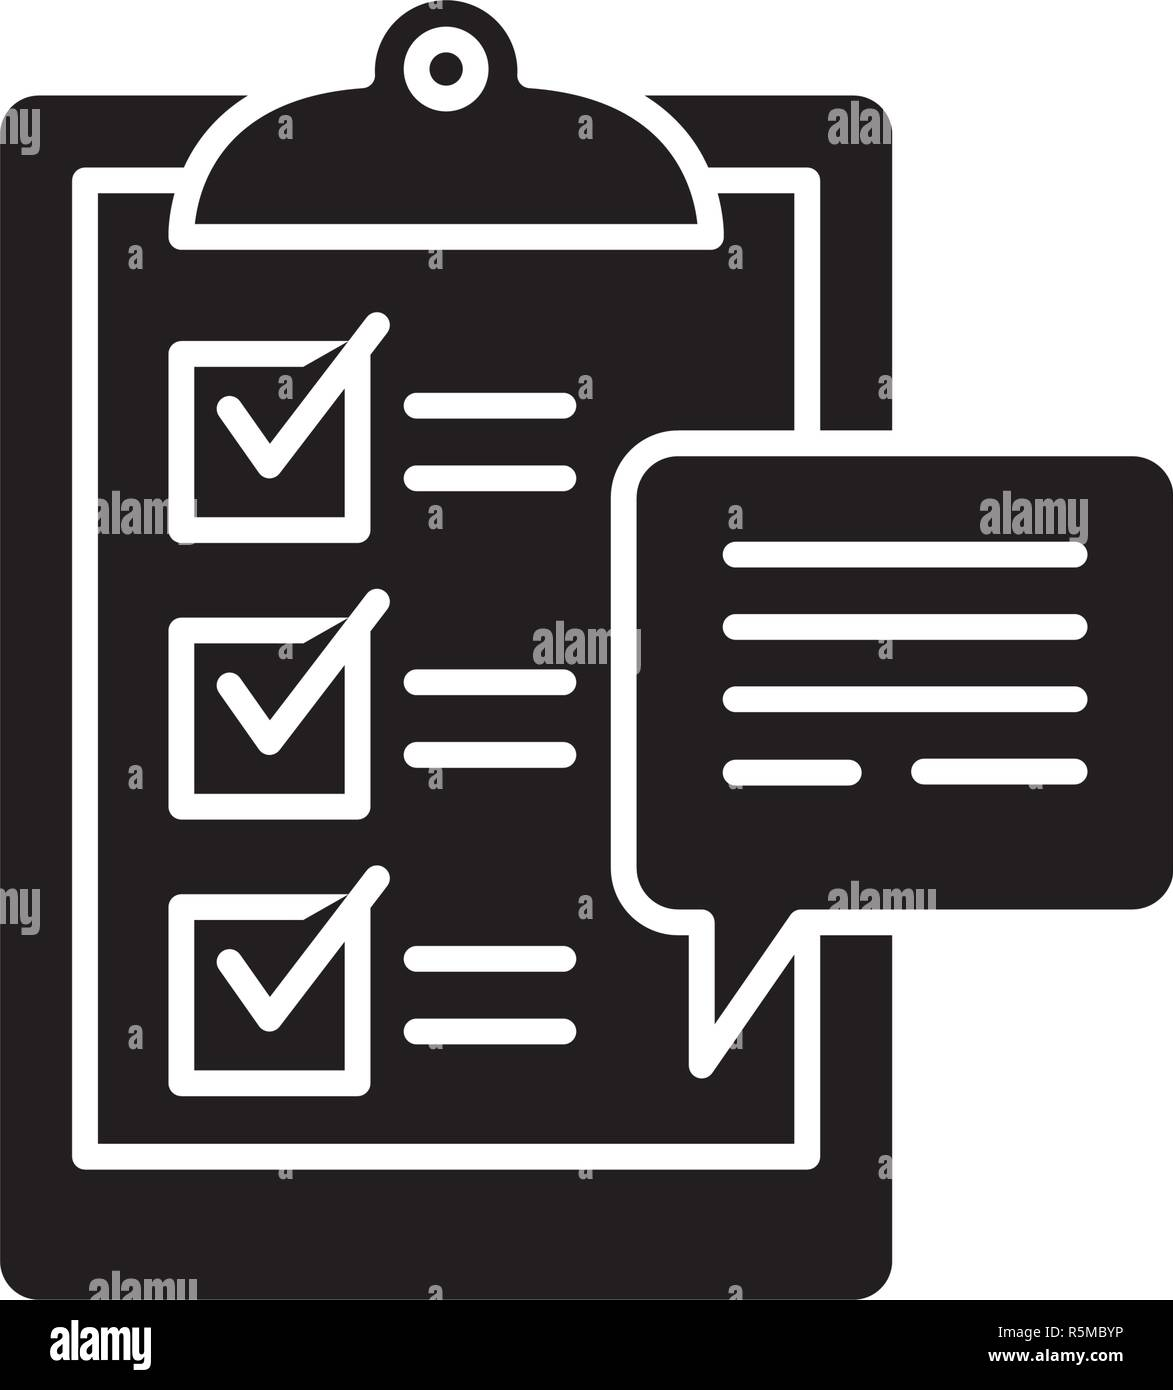 Customer surveys black icon, vector sign on isolated background. Customer surveys concept symbol, illustration  - Stock Image